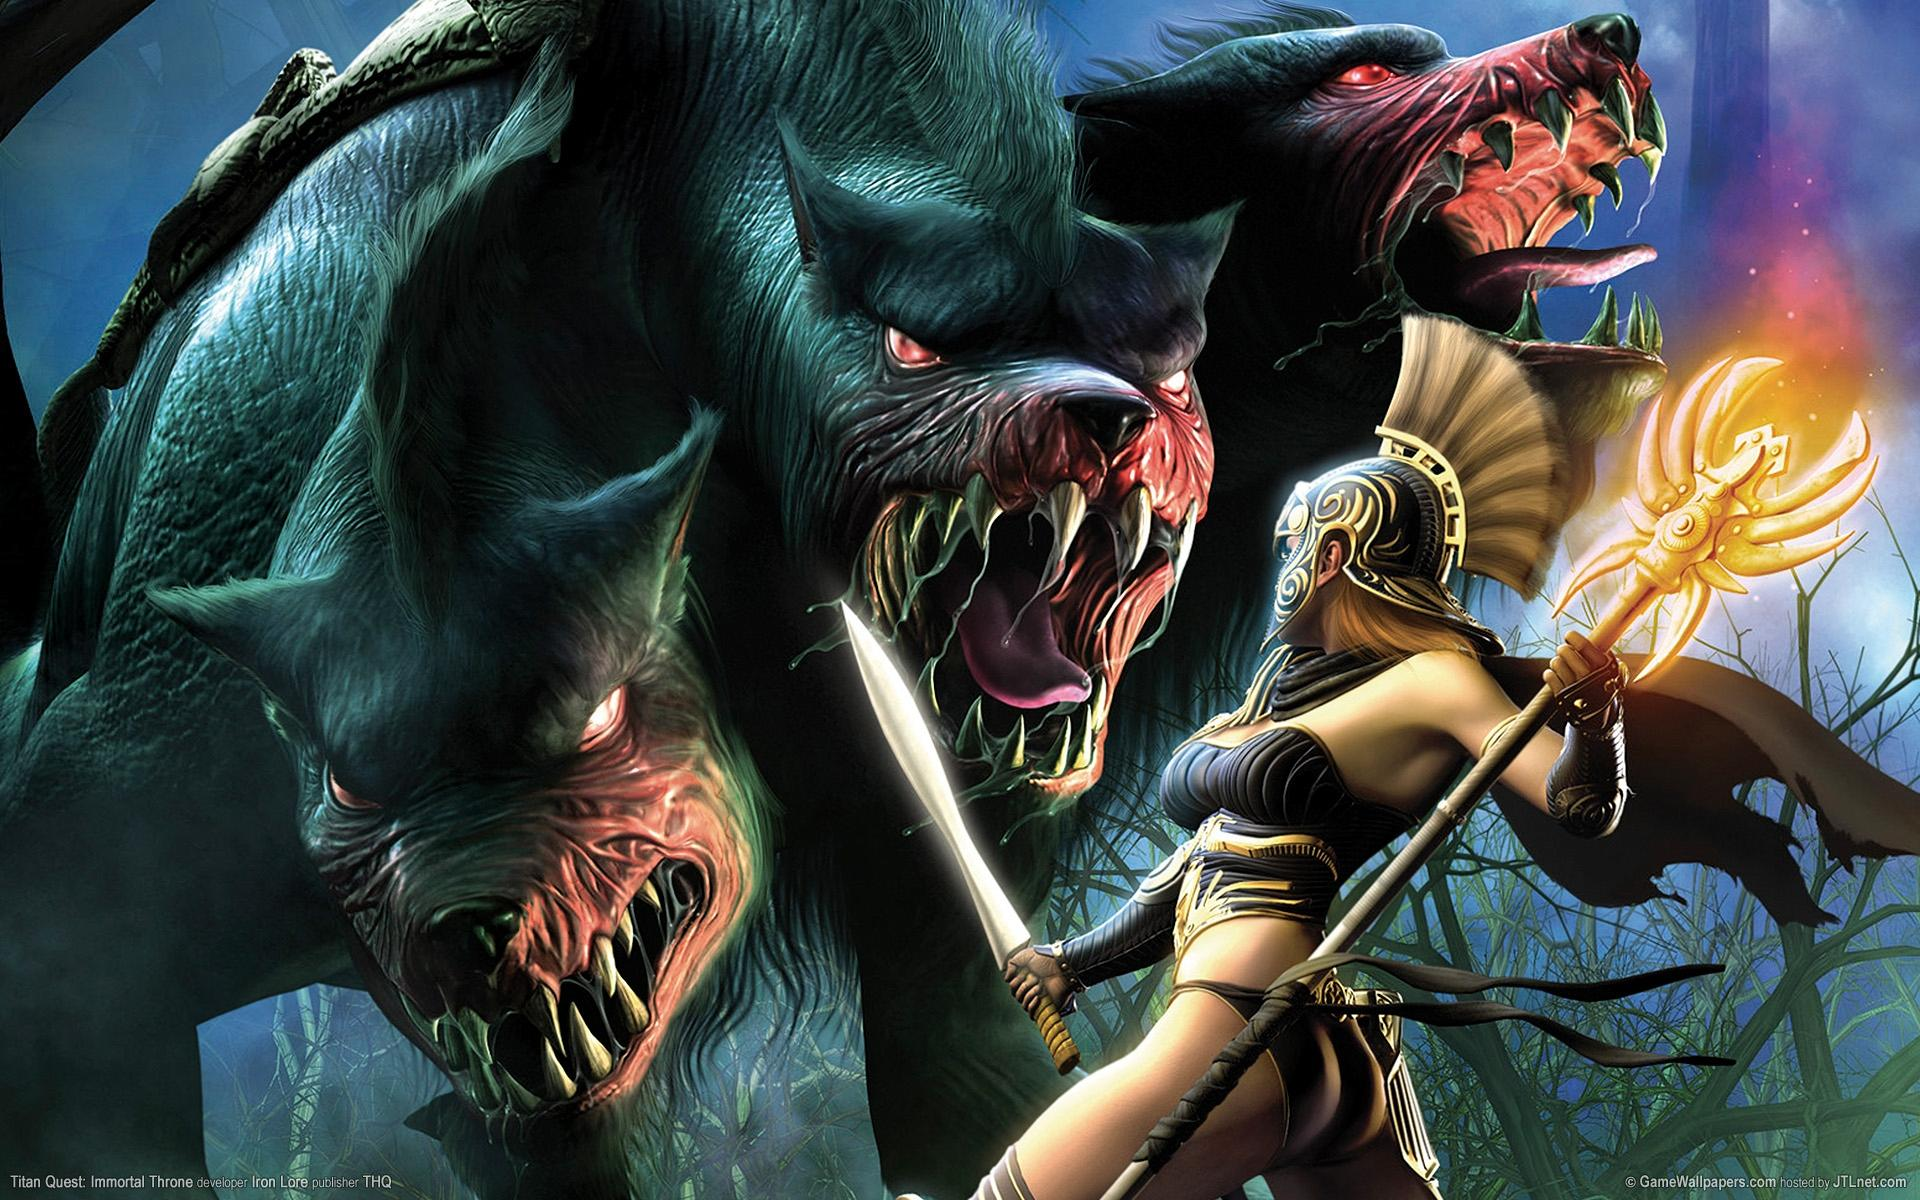 Titan Quest Immortal Throne Wallpapers on WallpaperDog